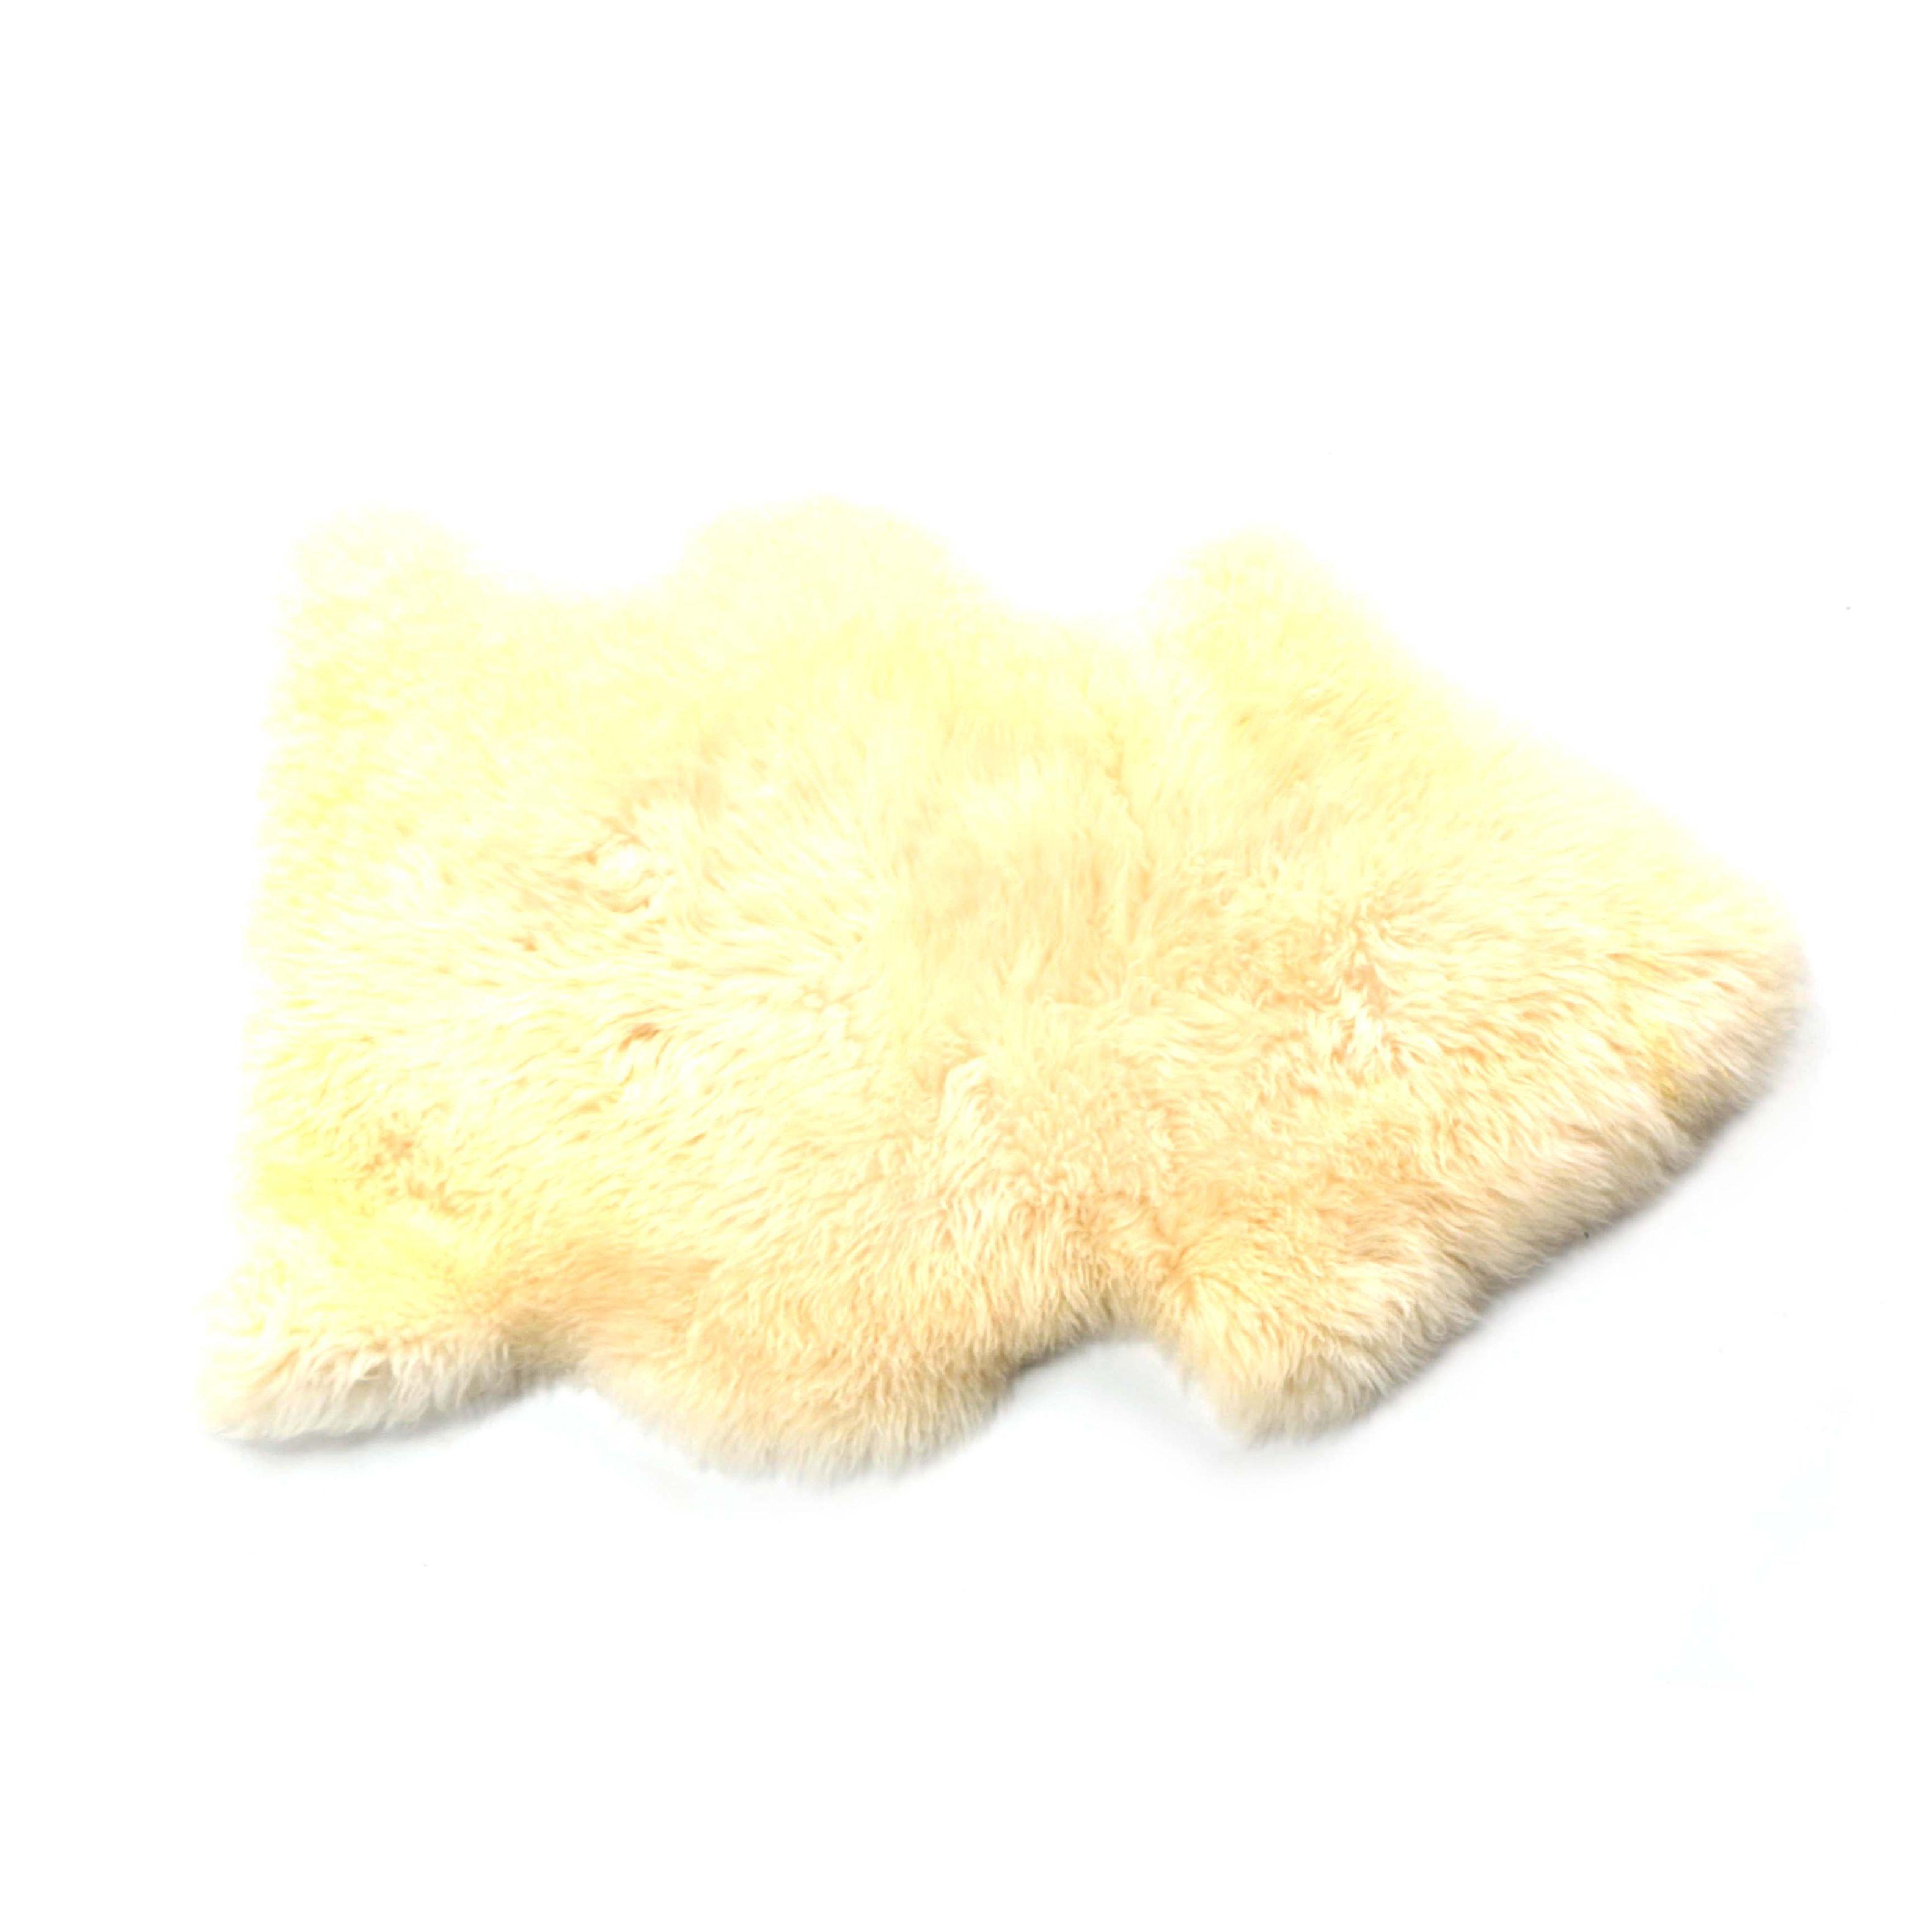 Sheepskin Accent Rug